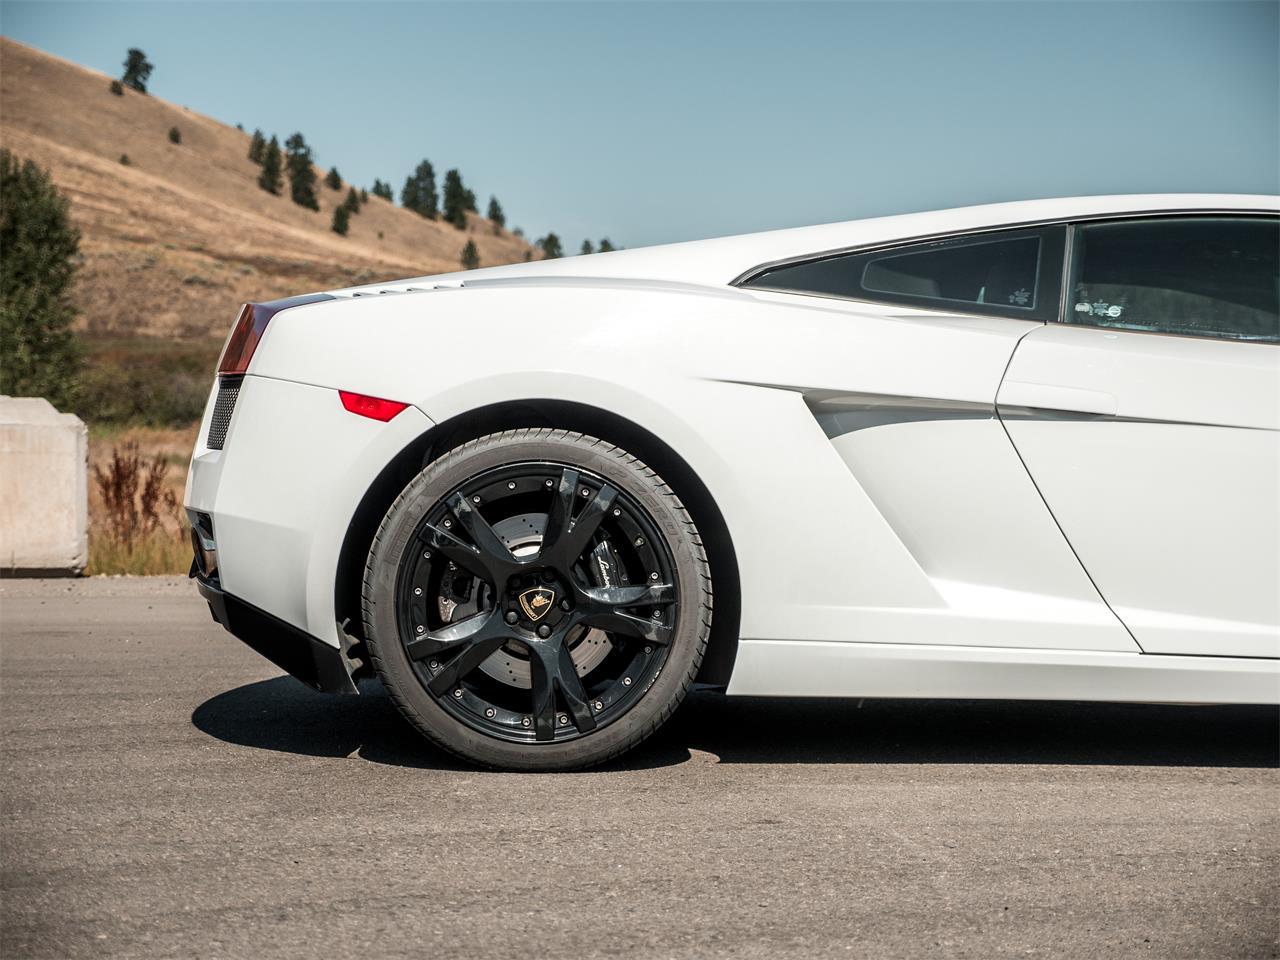 Large Picture of 2008 Lamborghini Gallardo - $91,819.00 Offered by ABC Dealer TEST - QUI2